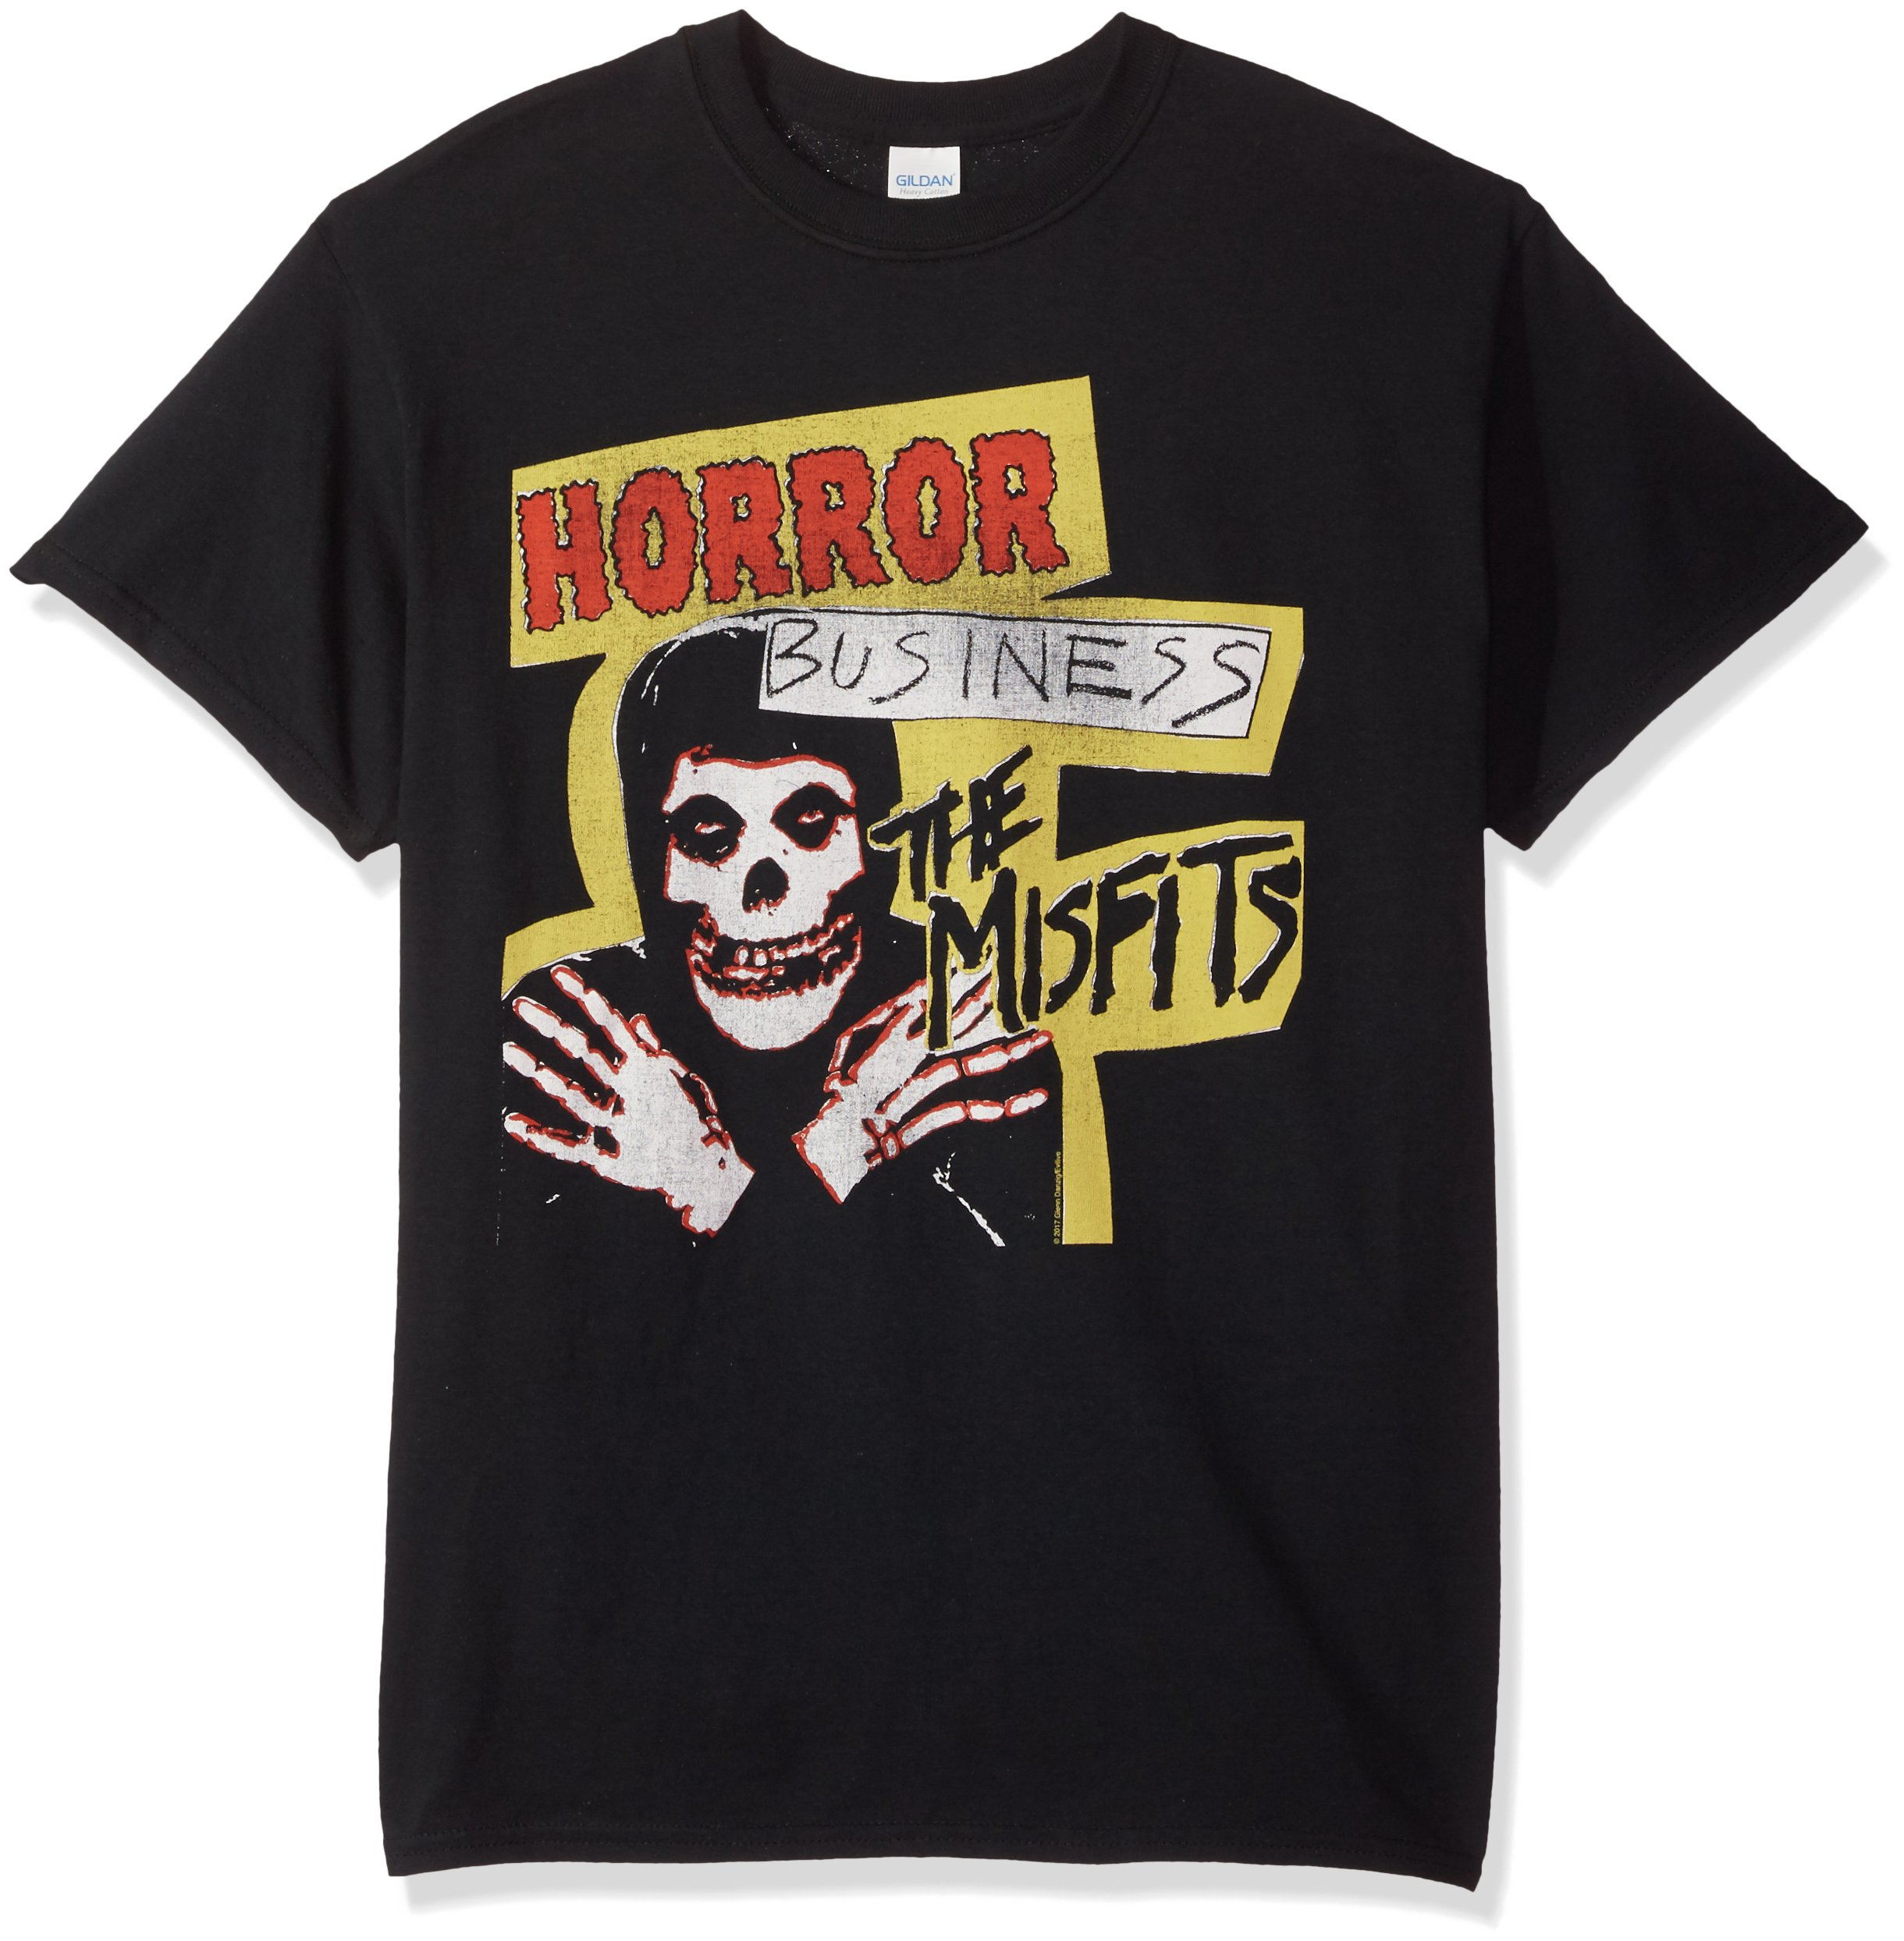 FEA Men's Misfits Horror Business T-Shirt, Black, Medium